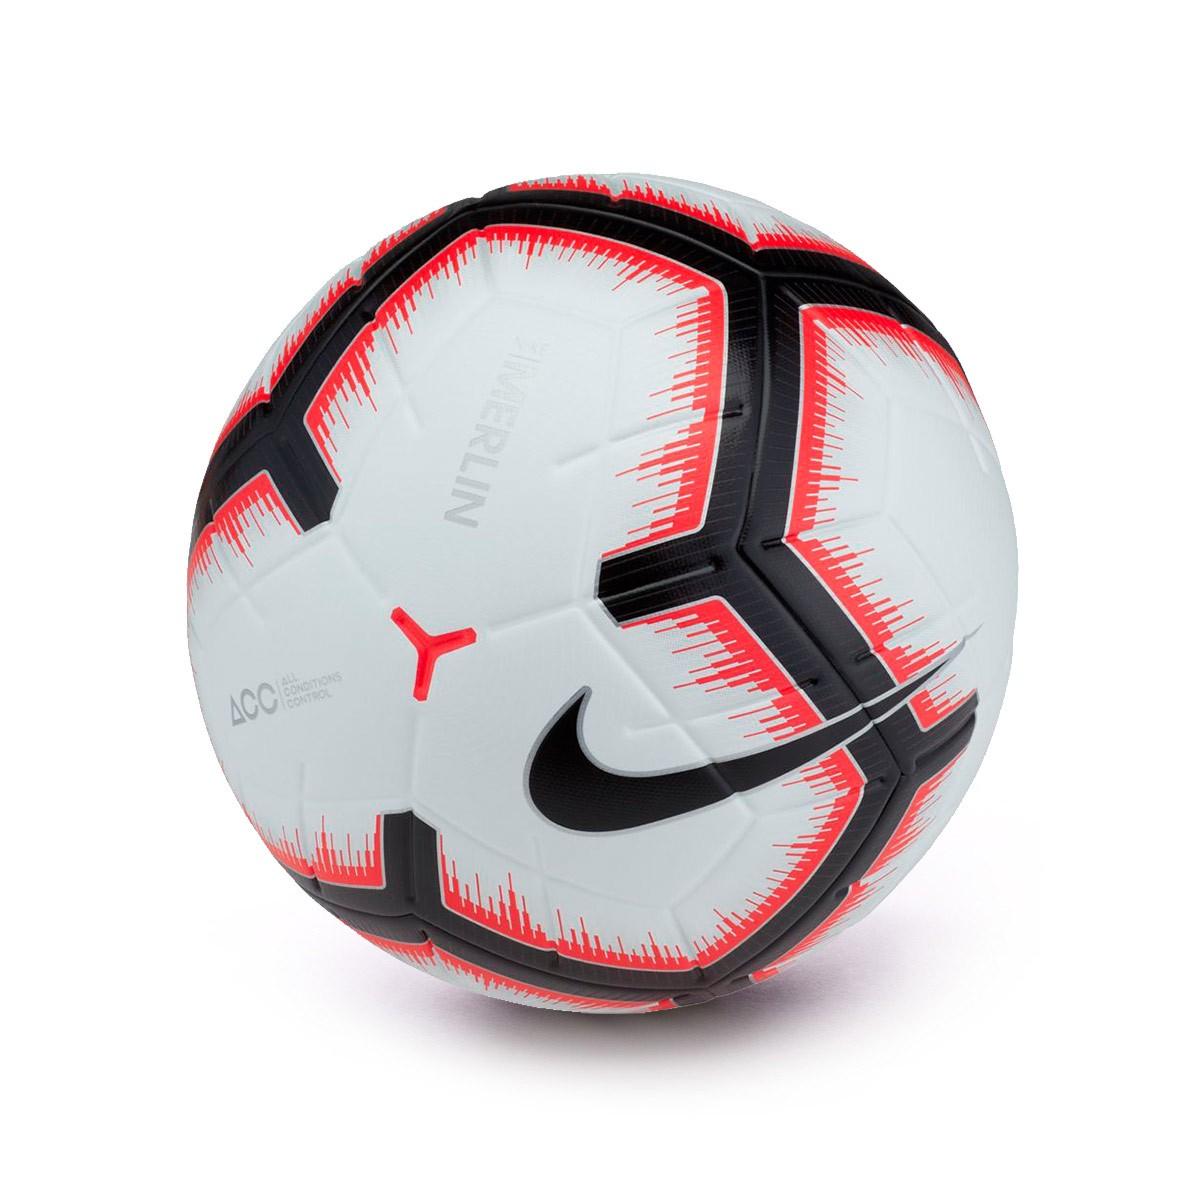 Nike Merlin White Bright De Crimson 2018 2019 Nos Bola Futebol Liga w8mNn0